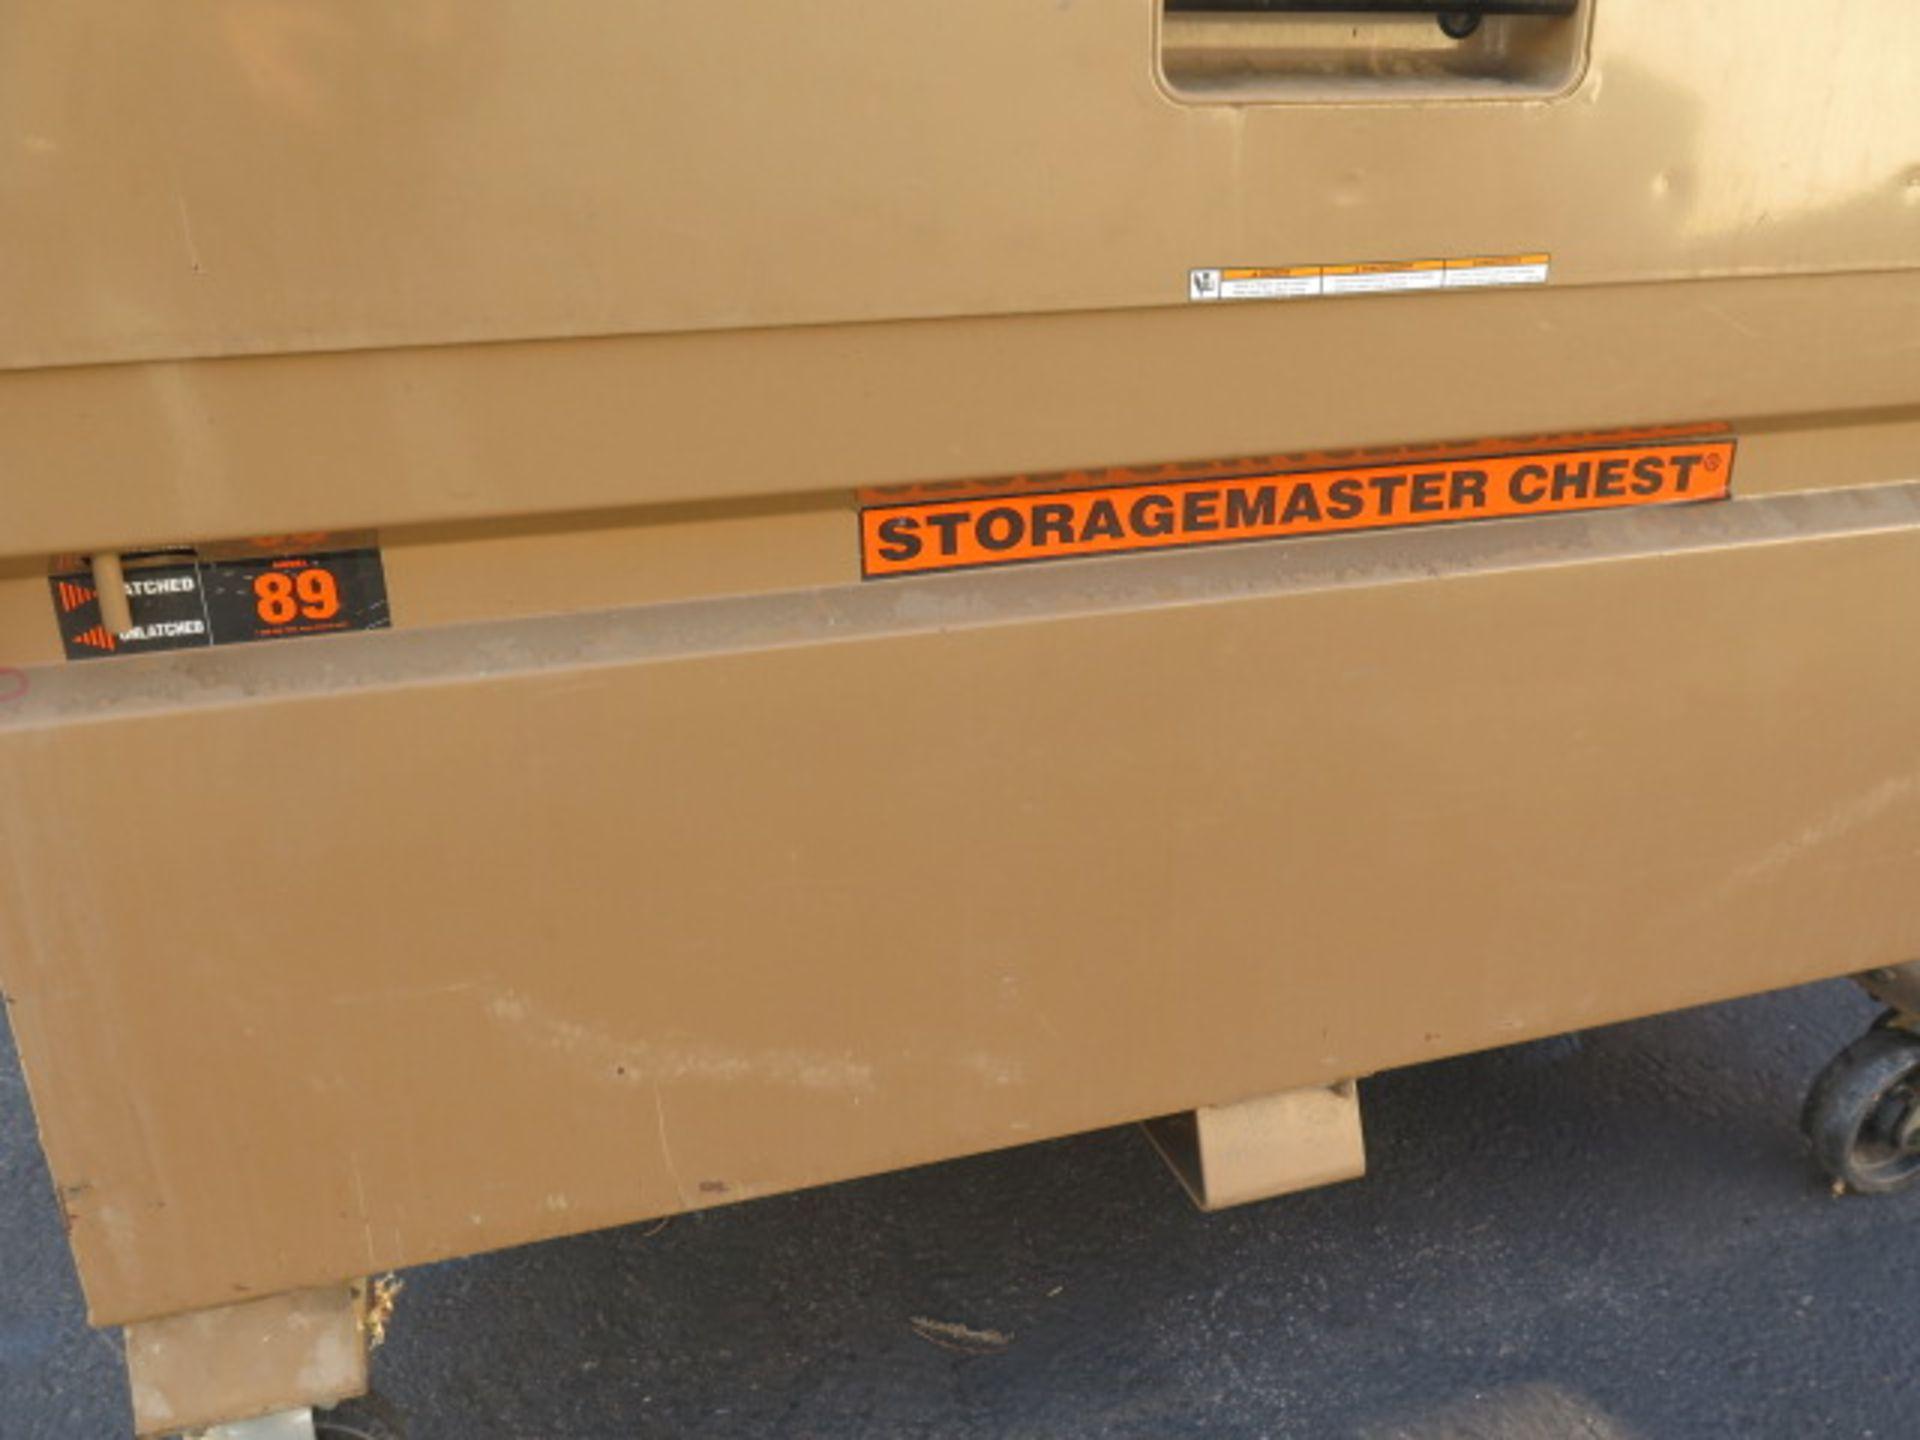 Knaack mdl. 89 Storagemaster Rolling Job Box w/ Come-Alongs (SOLD AS-IS - NO WARRANTY) - Image 3 of 12